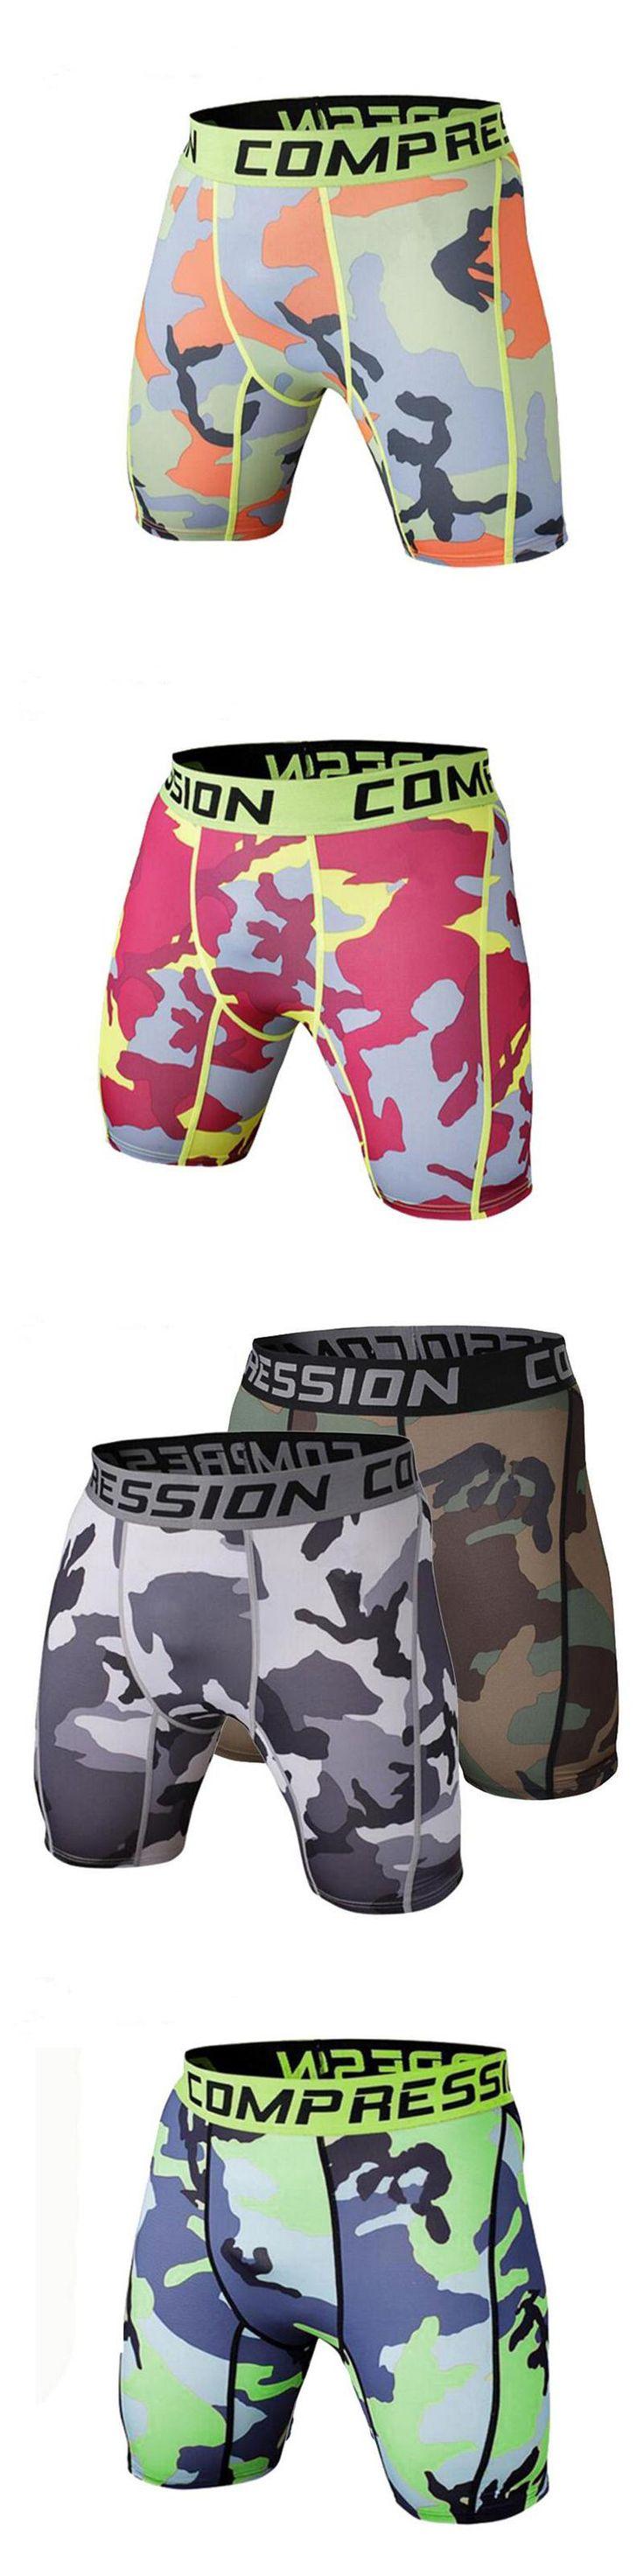 Mens Compression Shorts 2016 Summer Camouflage Bermuda Shorts Fitness Men Cossfit Bodybuilding Tights Camo Shorts